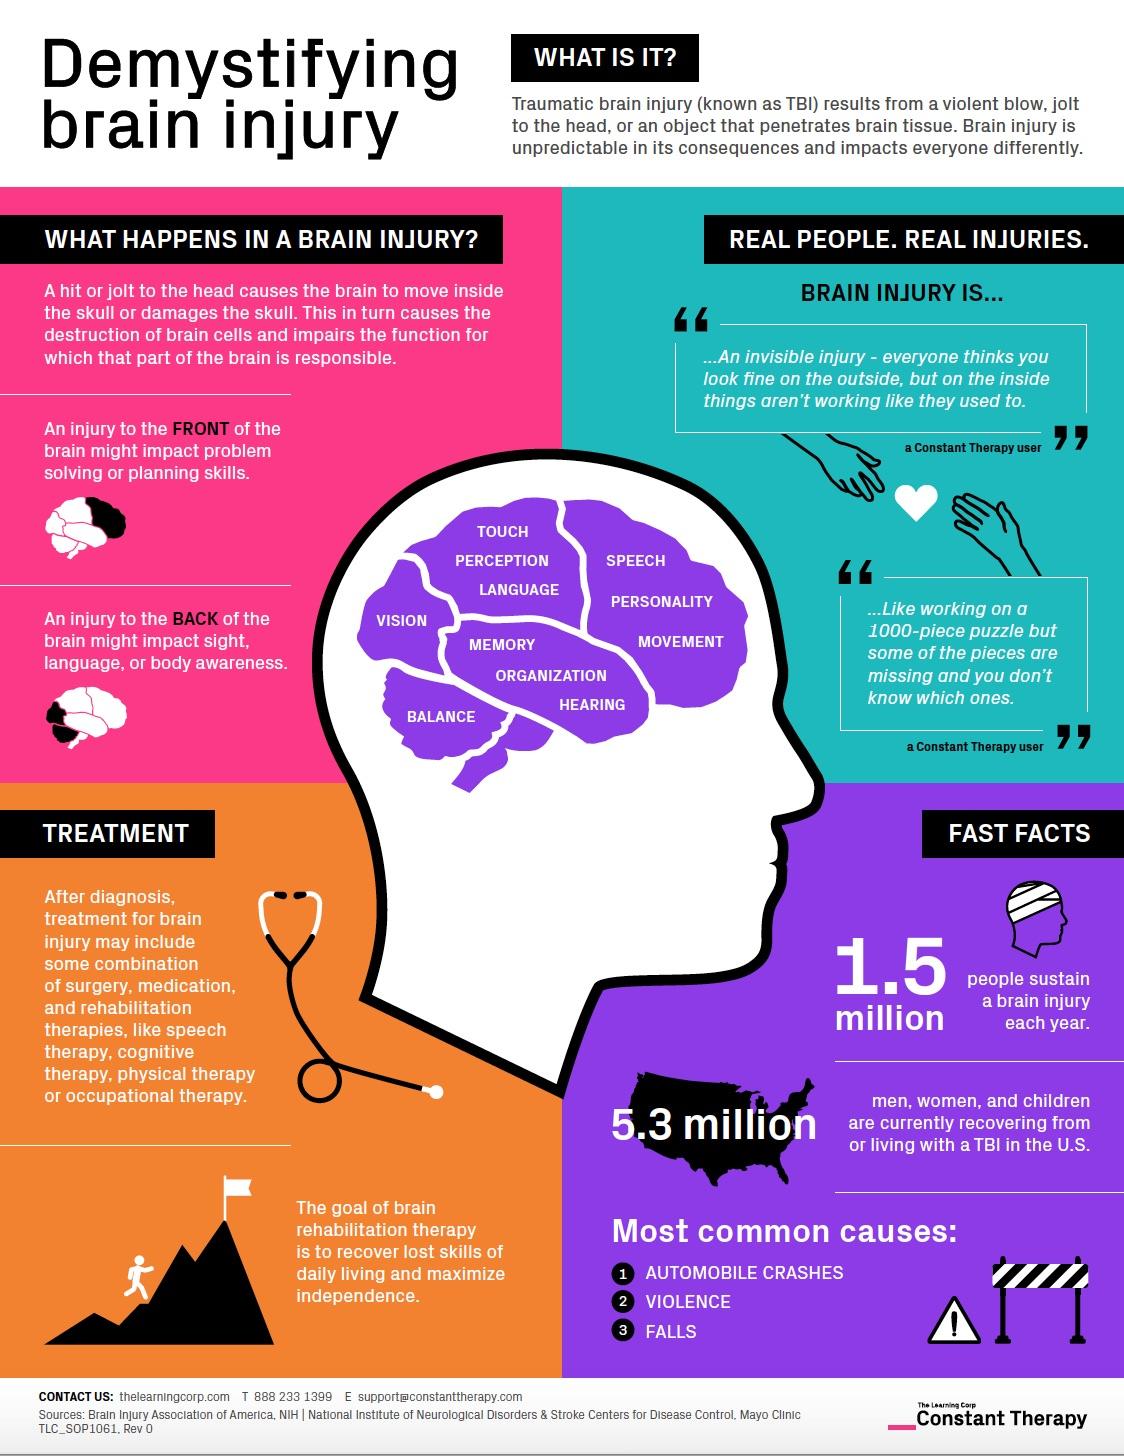 Demystifying Brain Injury